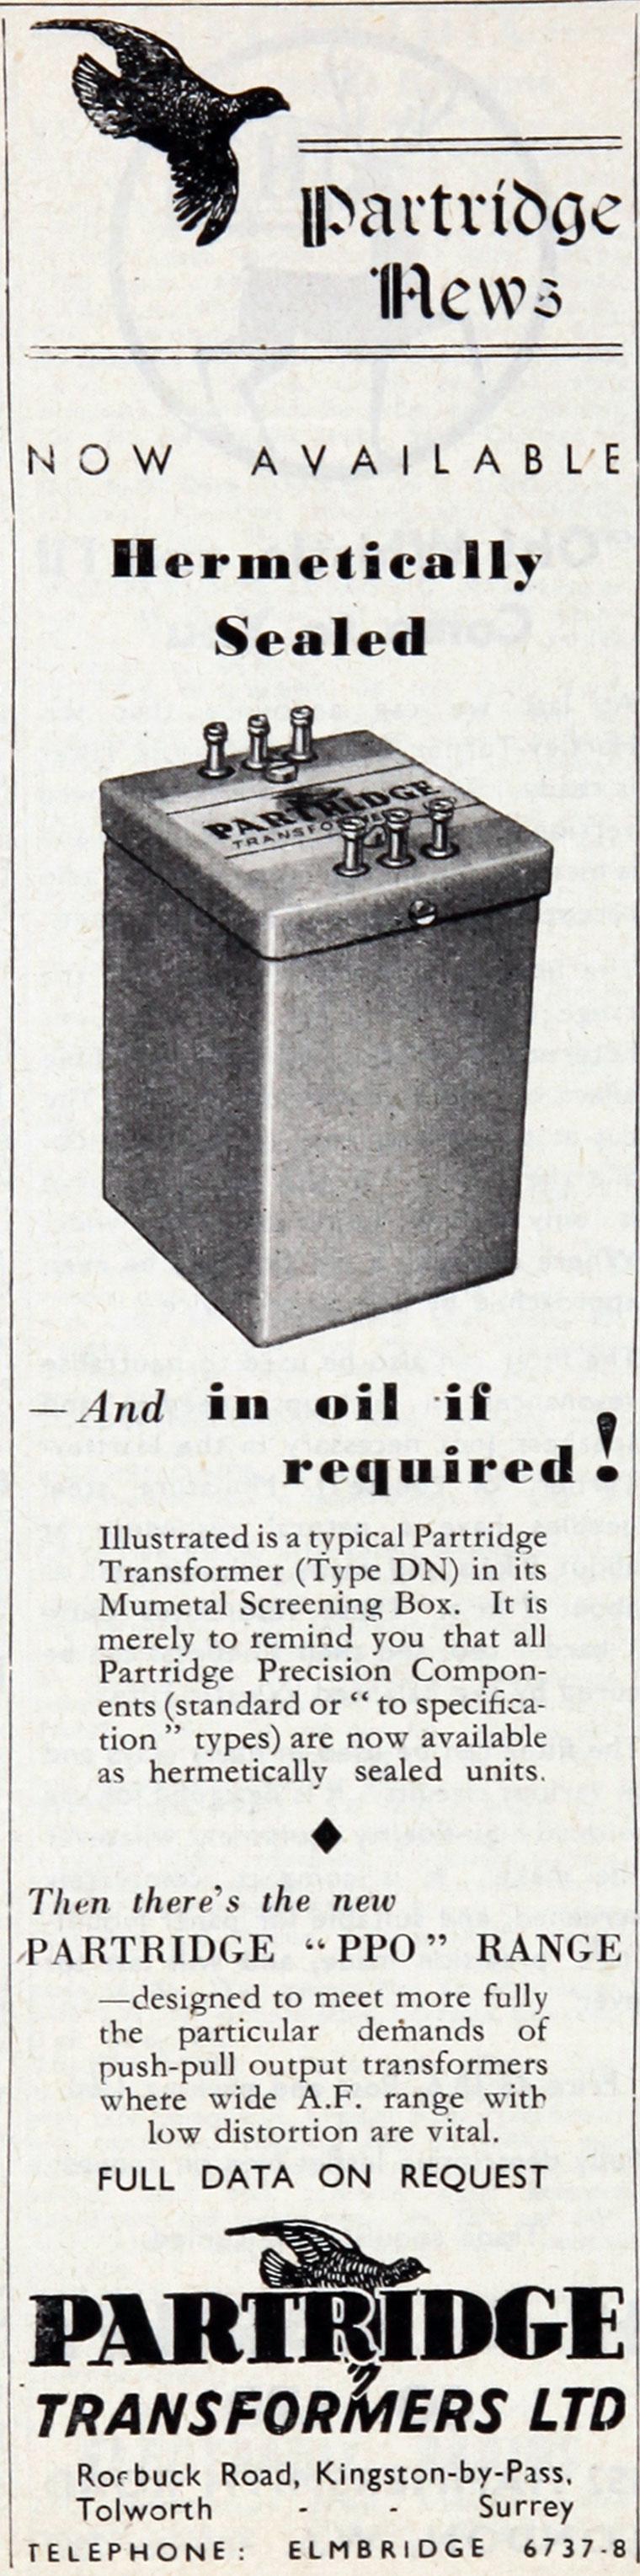 Dating partridge transformere